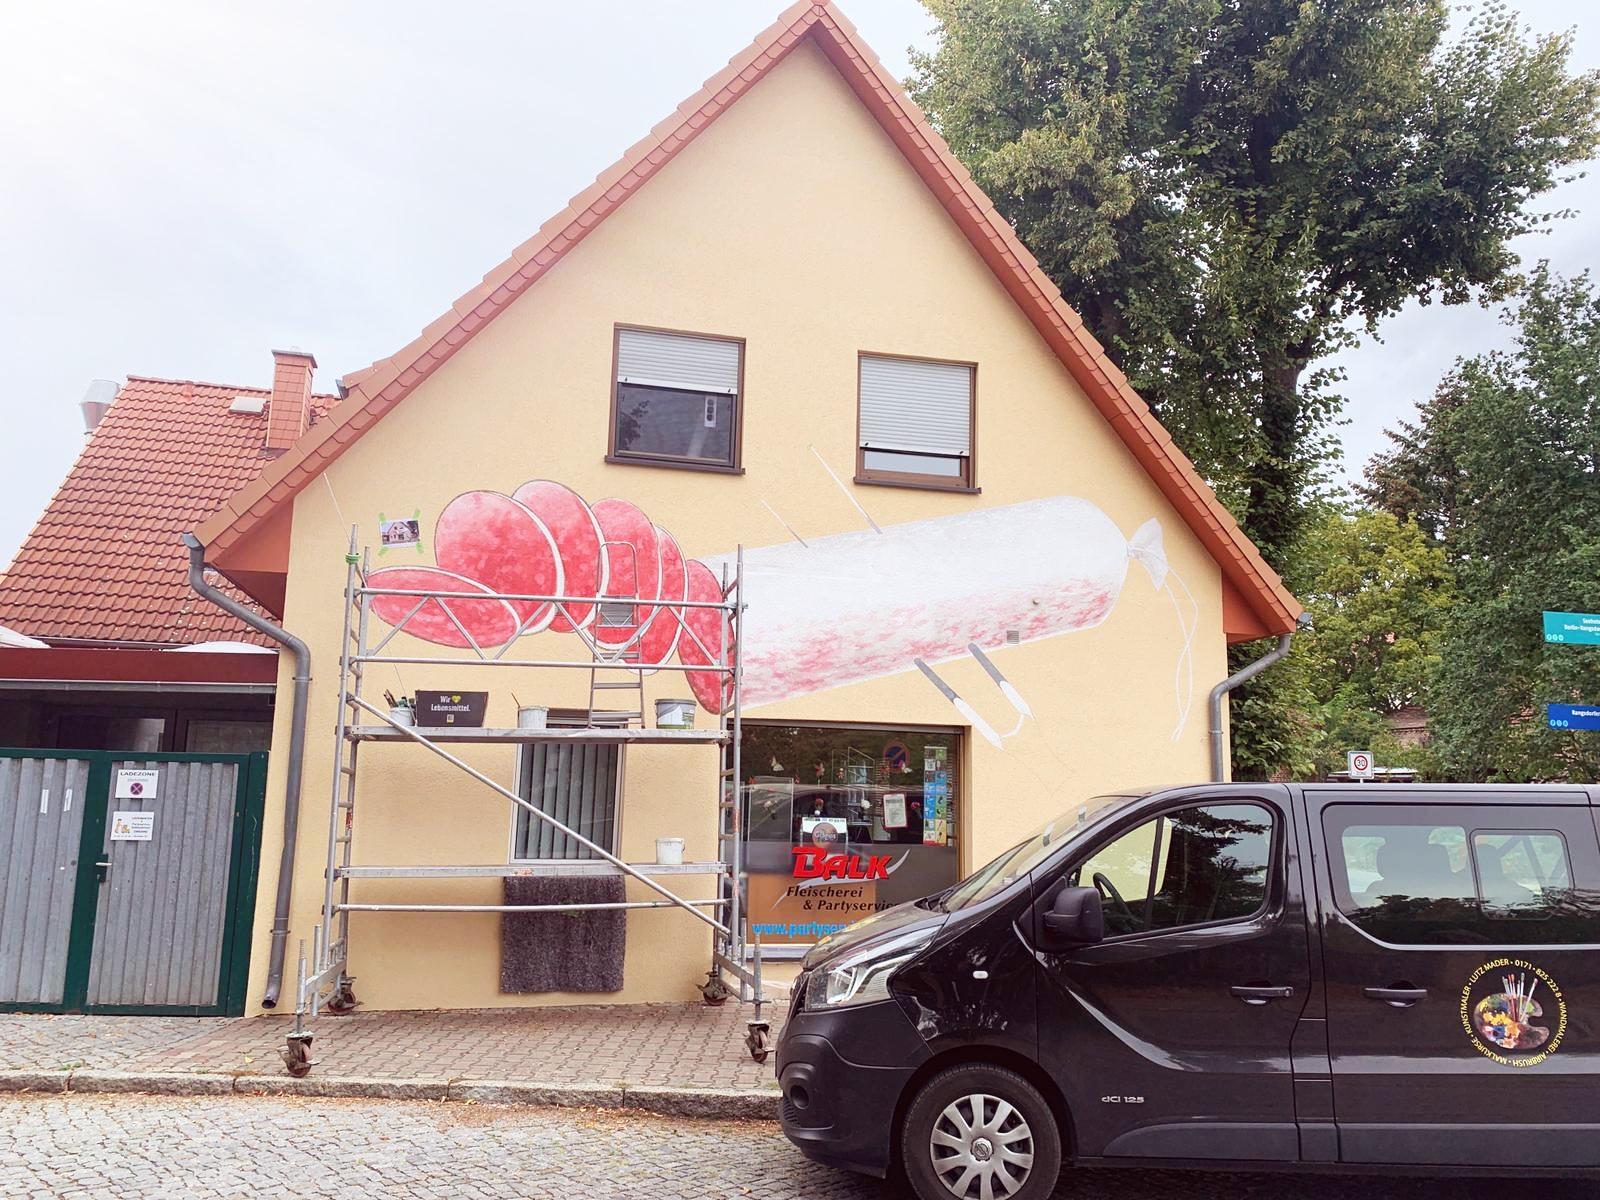 Fleischerei Graffiti Geschäftsgestaltung